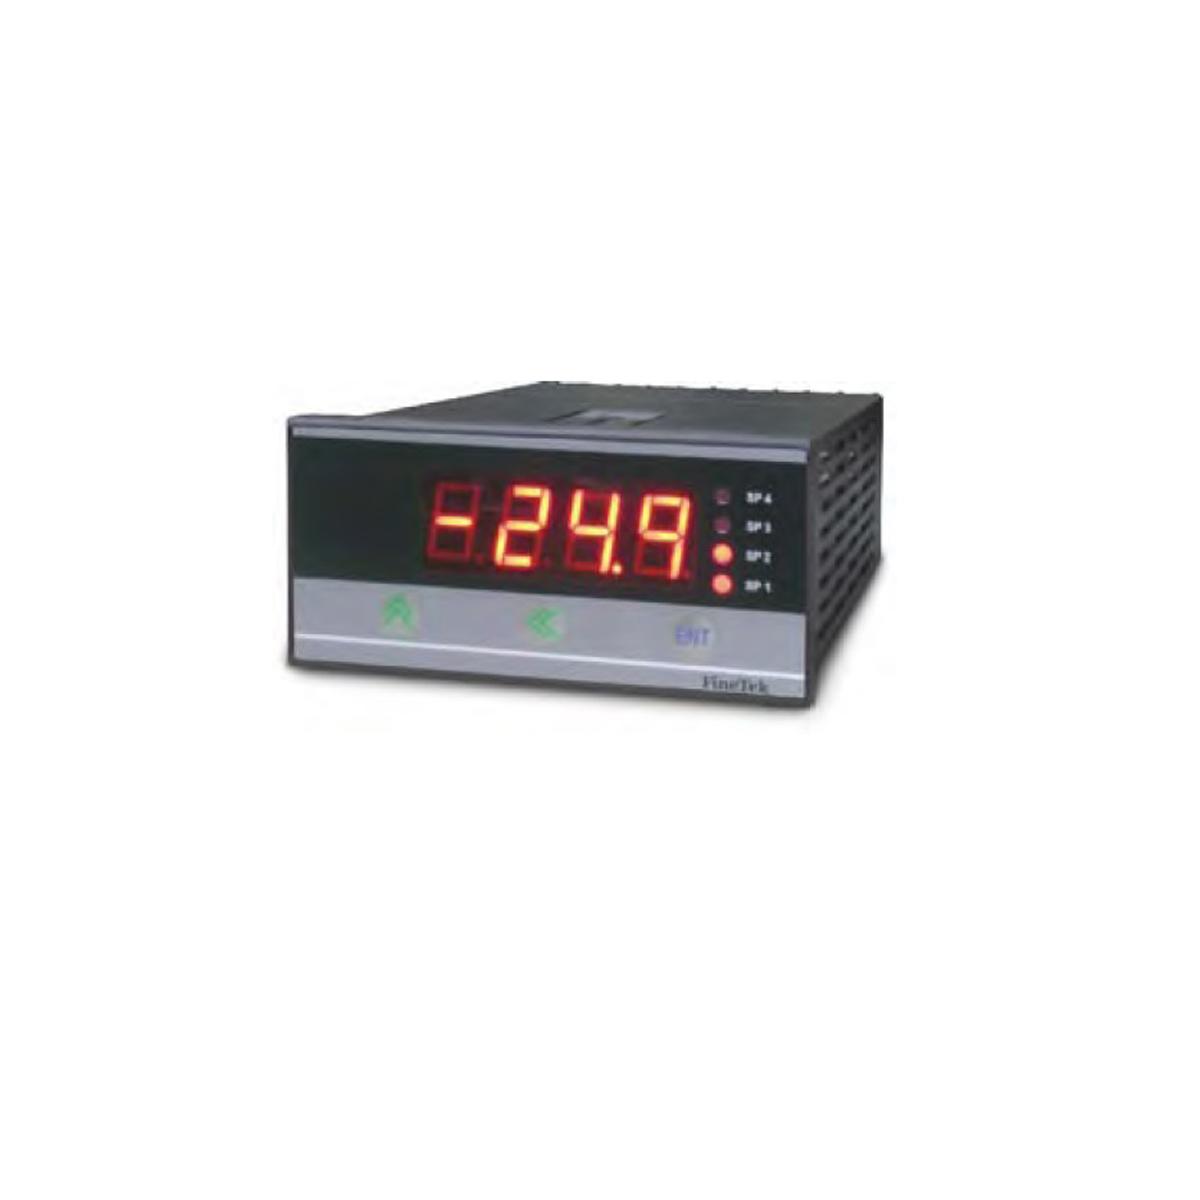 SANGI PM1430 Series แบบมิเตอร์ติดแผงสำหรับงานวัดระดับ